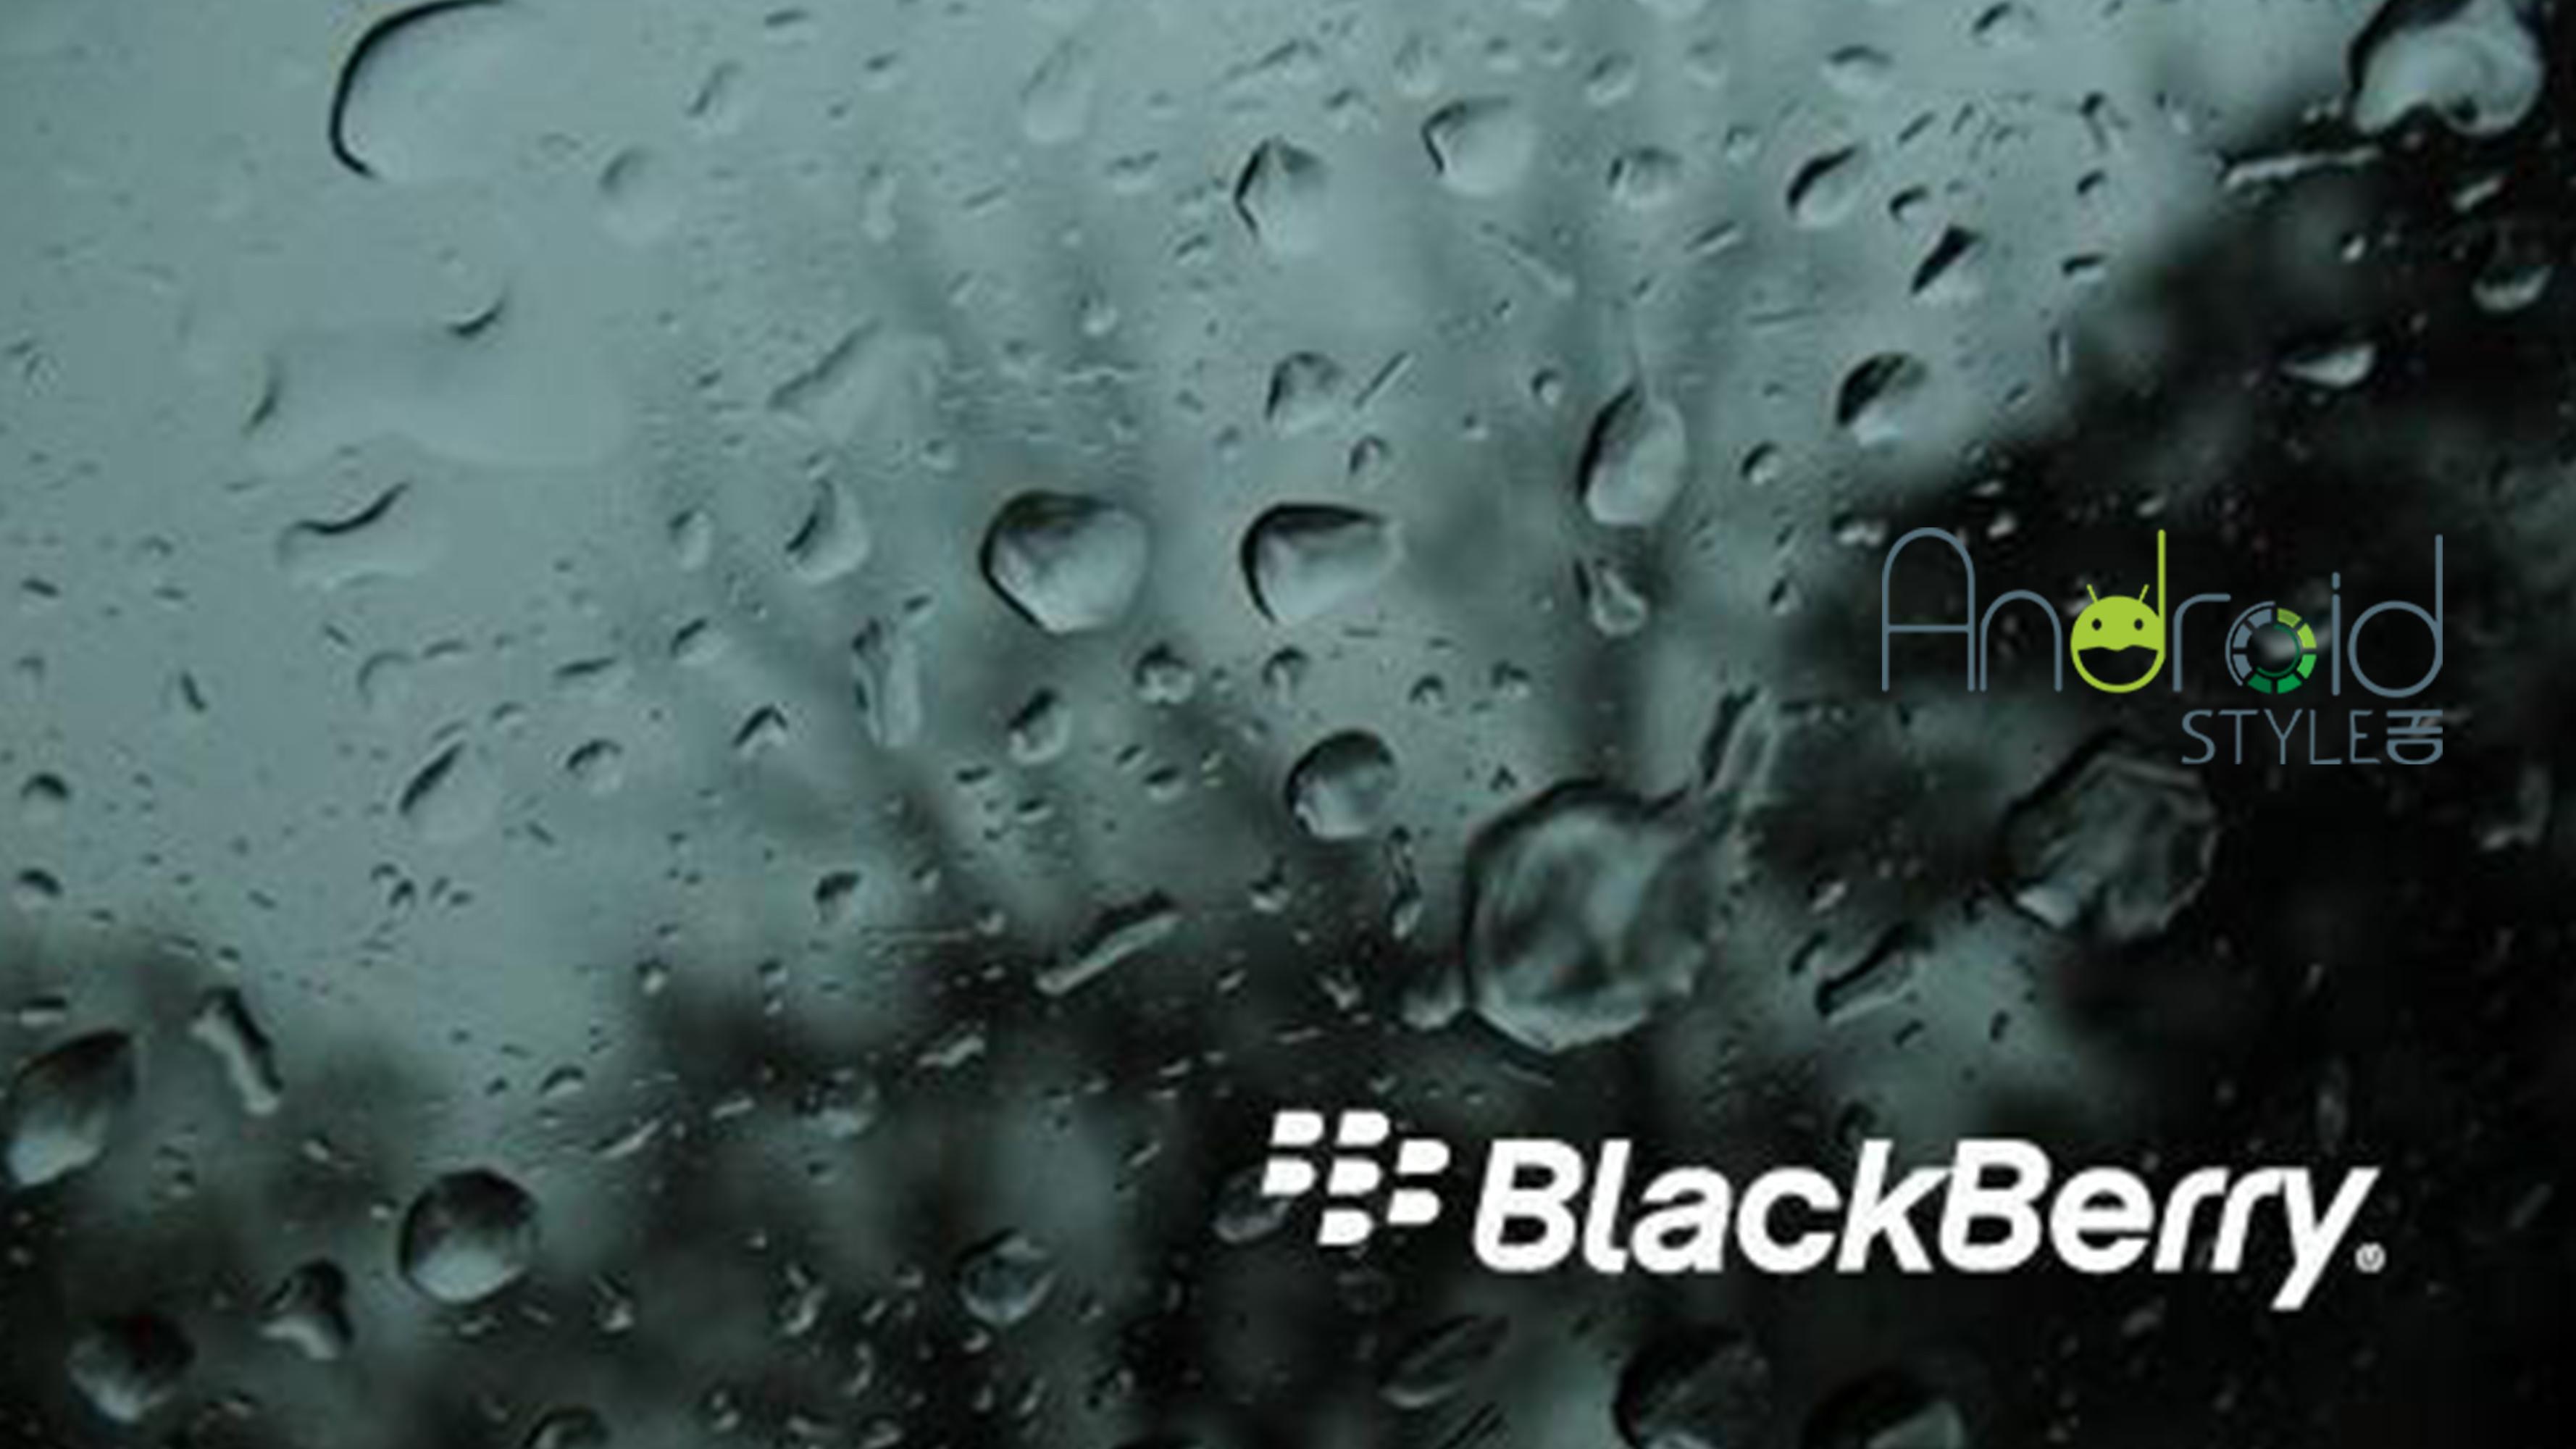 Addio BlackBerry!